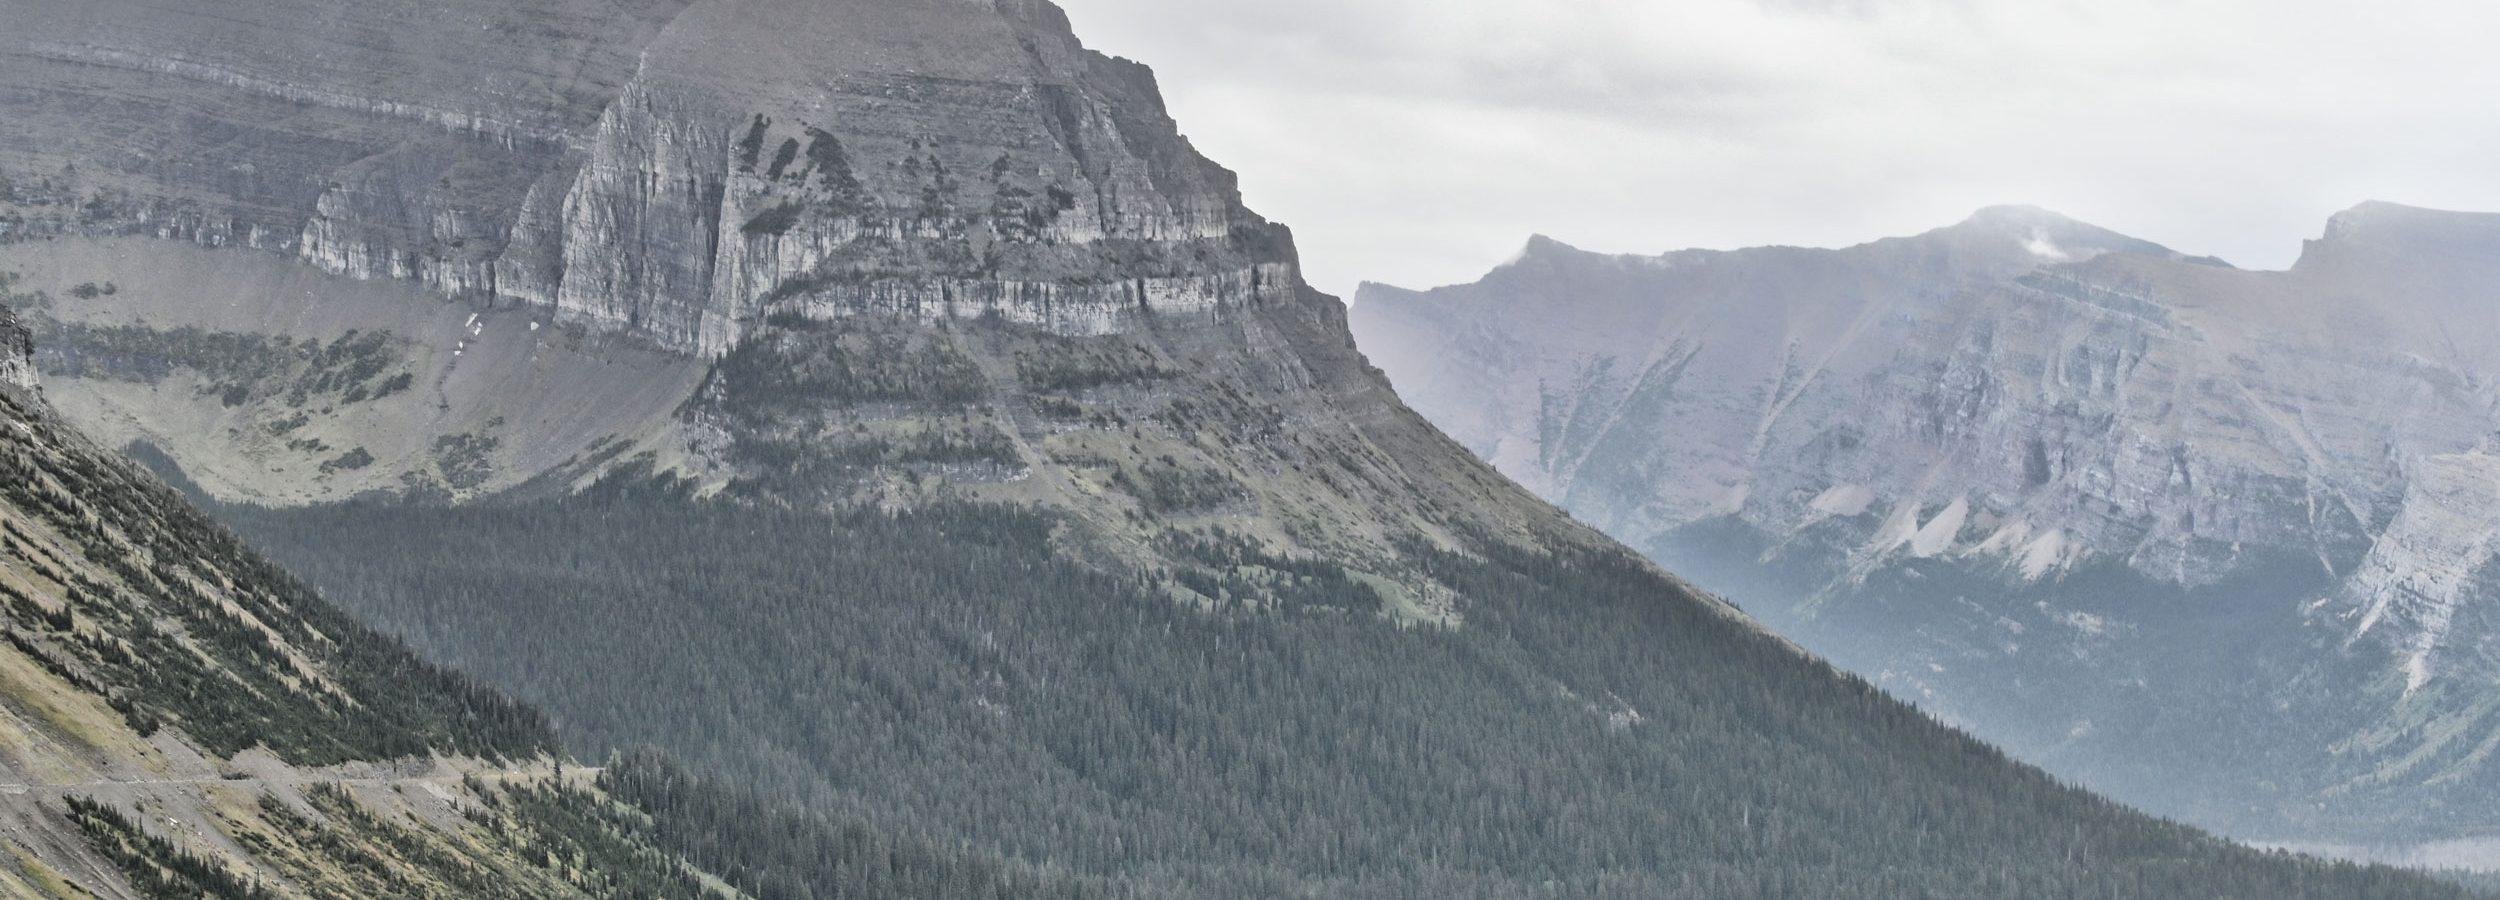 Glacier National Park, Montana - Park Narodowy Glacier w Montanie